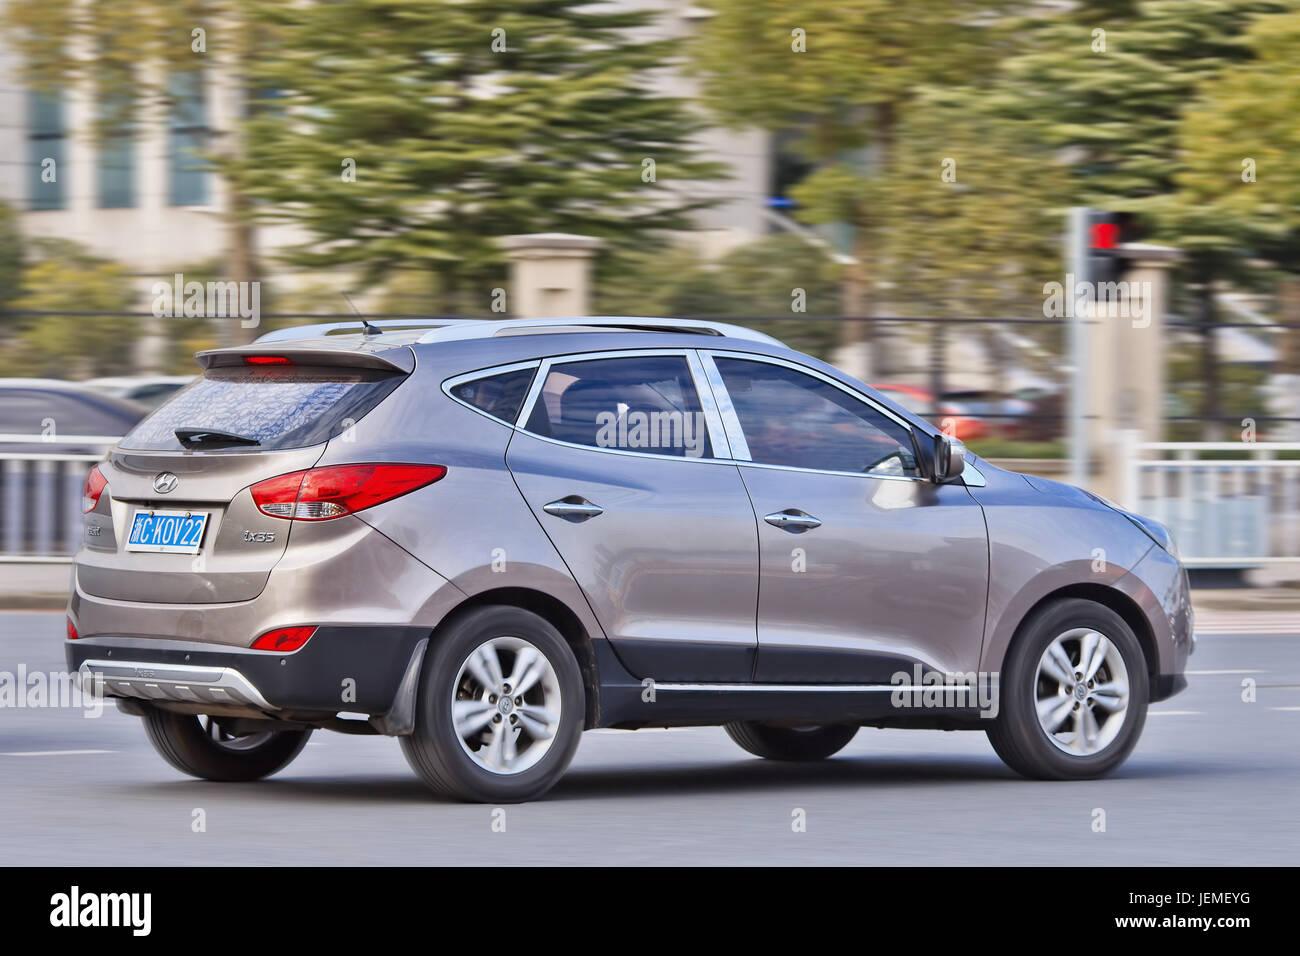 Beige Hyundai IX 35 SUV on the street. Hyundai car sales in China increased 11.2 percent in 2015, keeping an upward - Stock Image